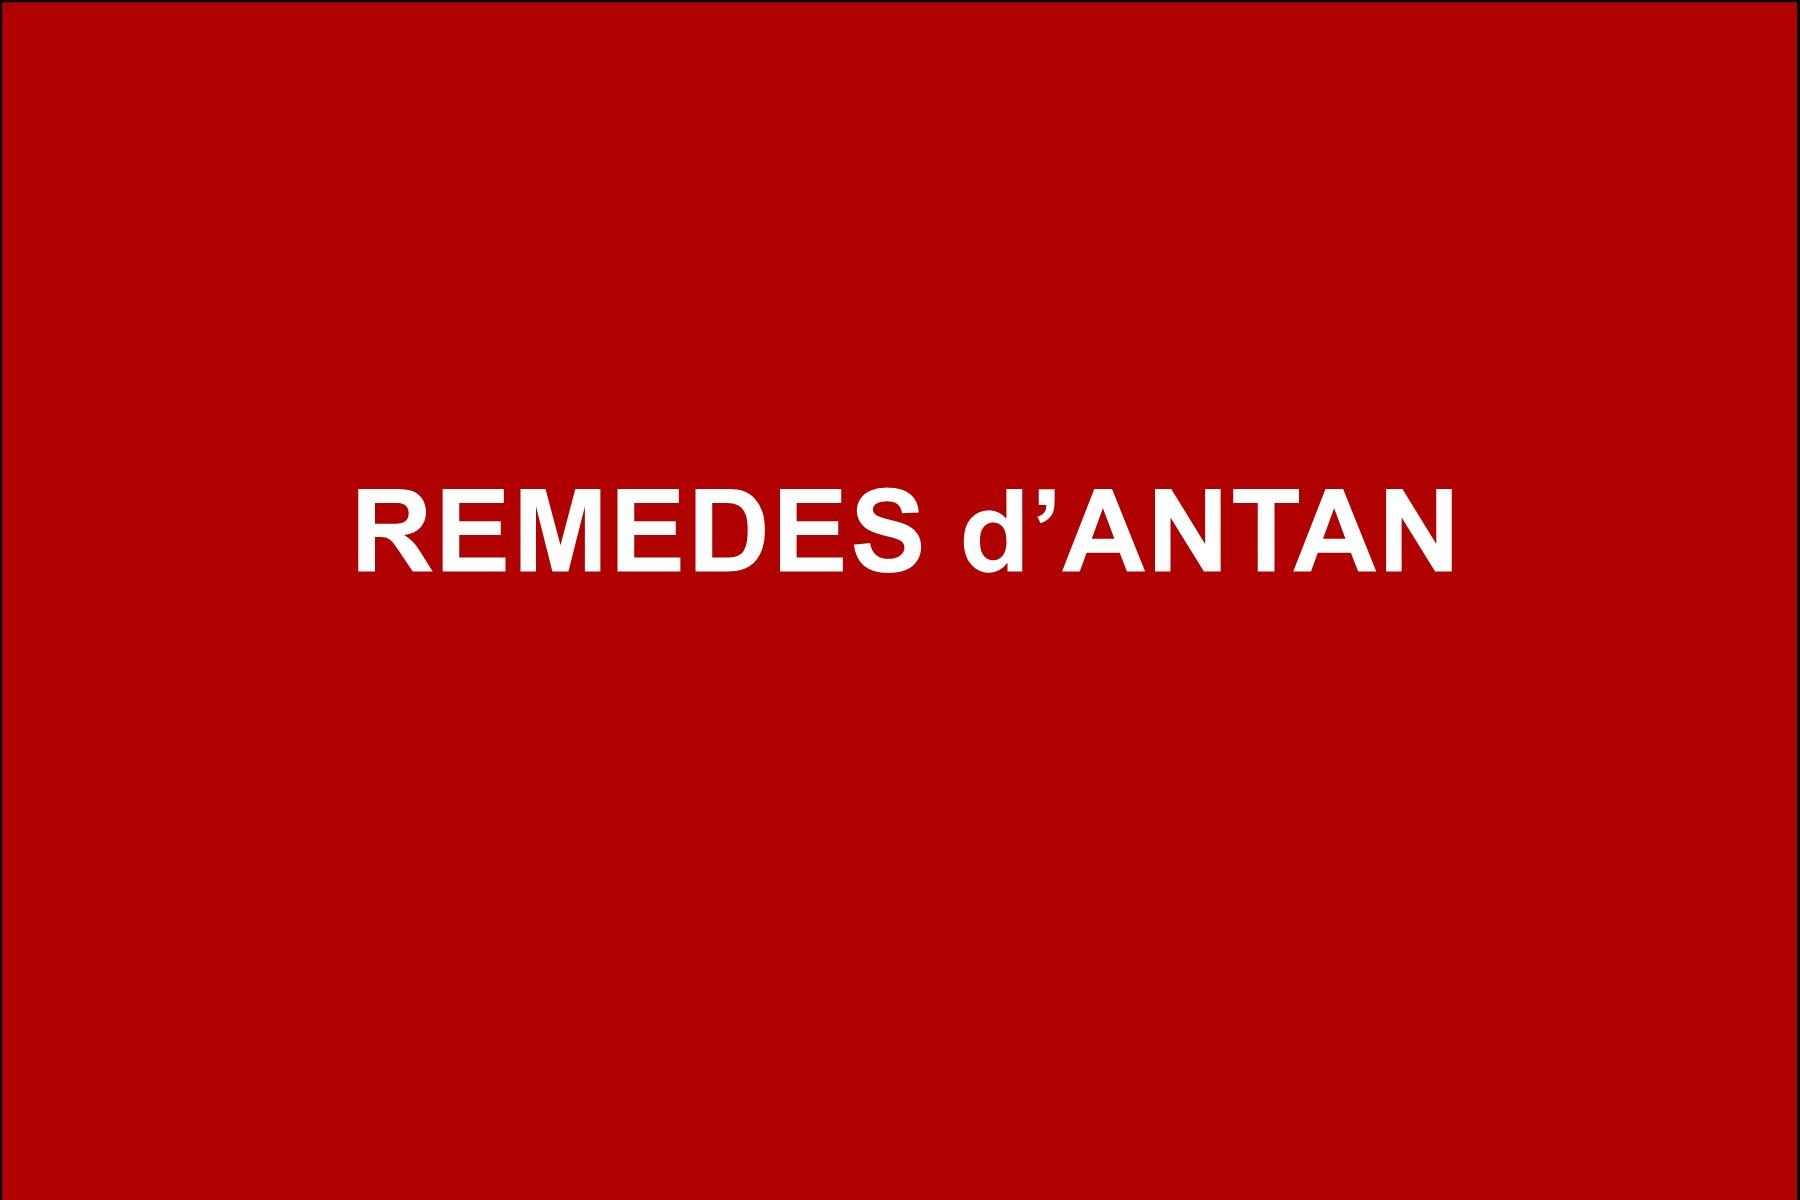 REMEDES D ANTAN